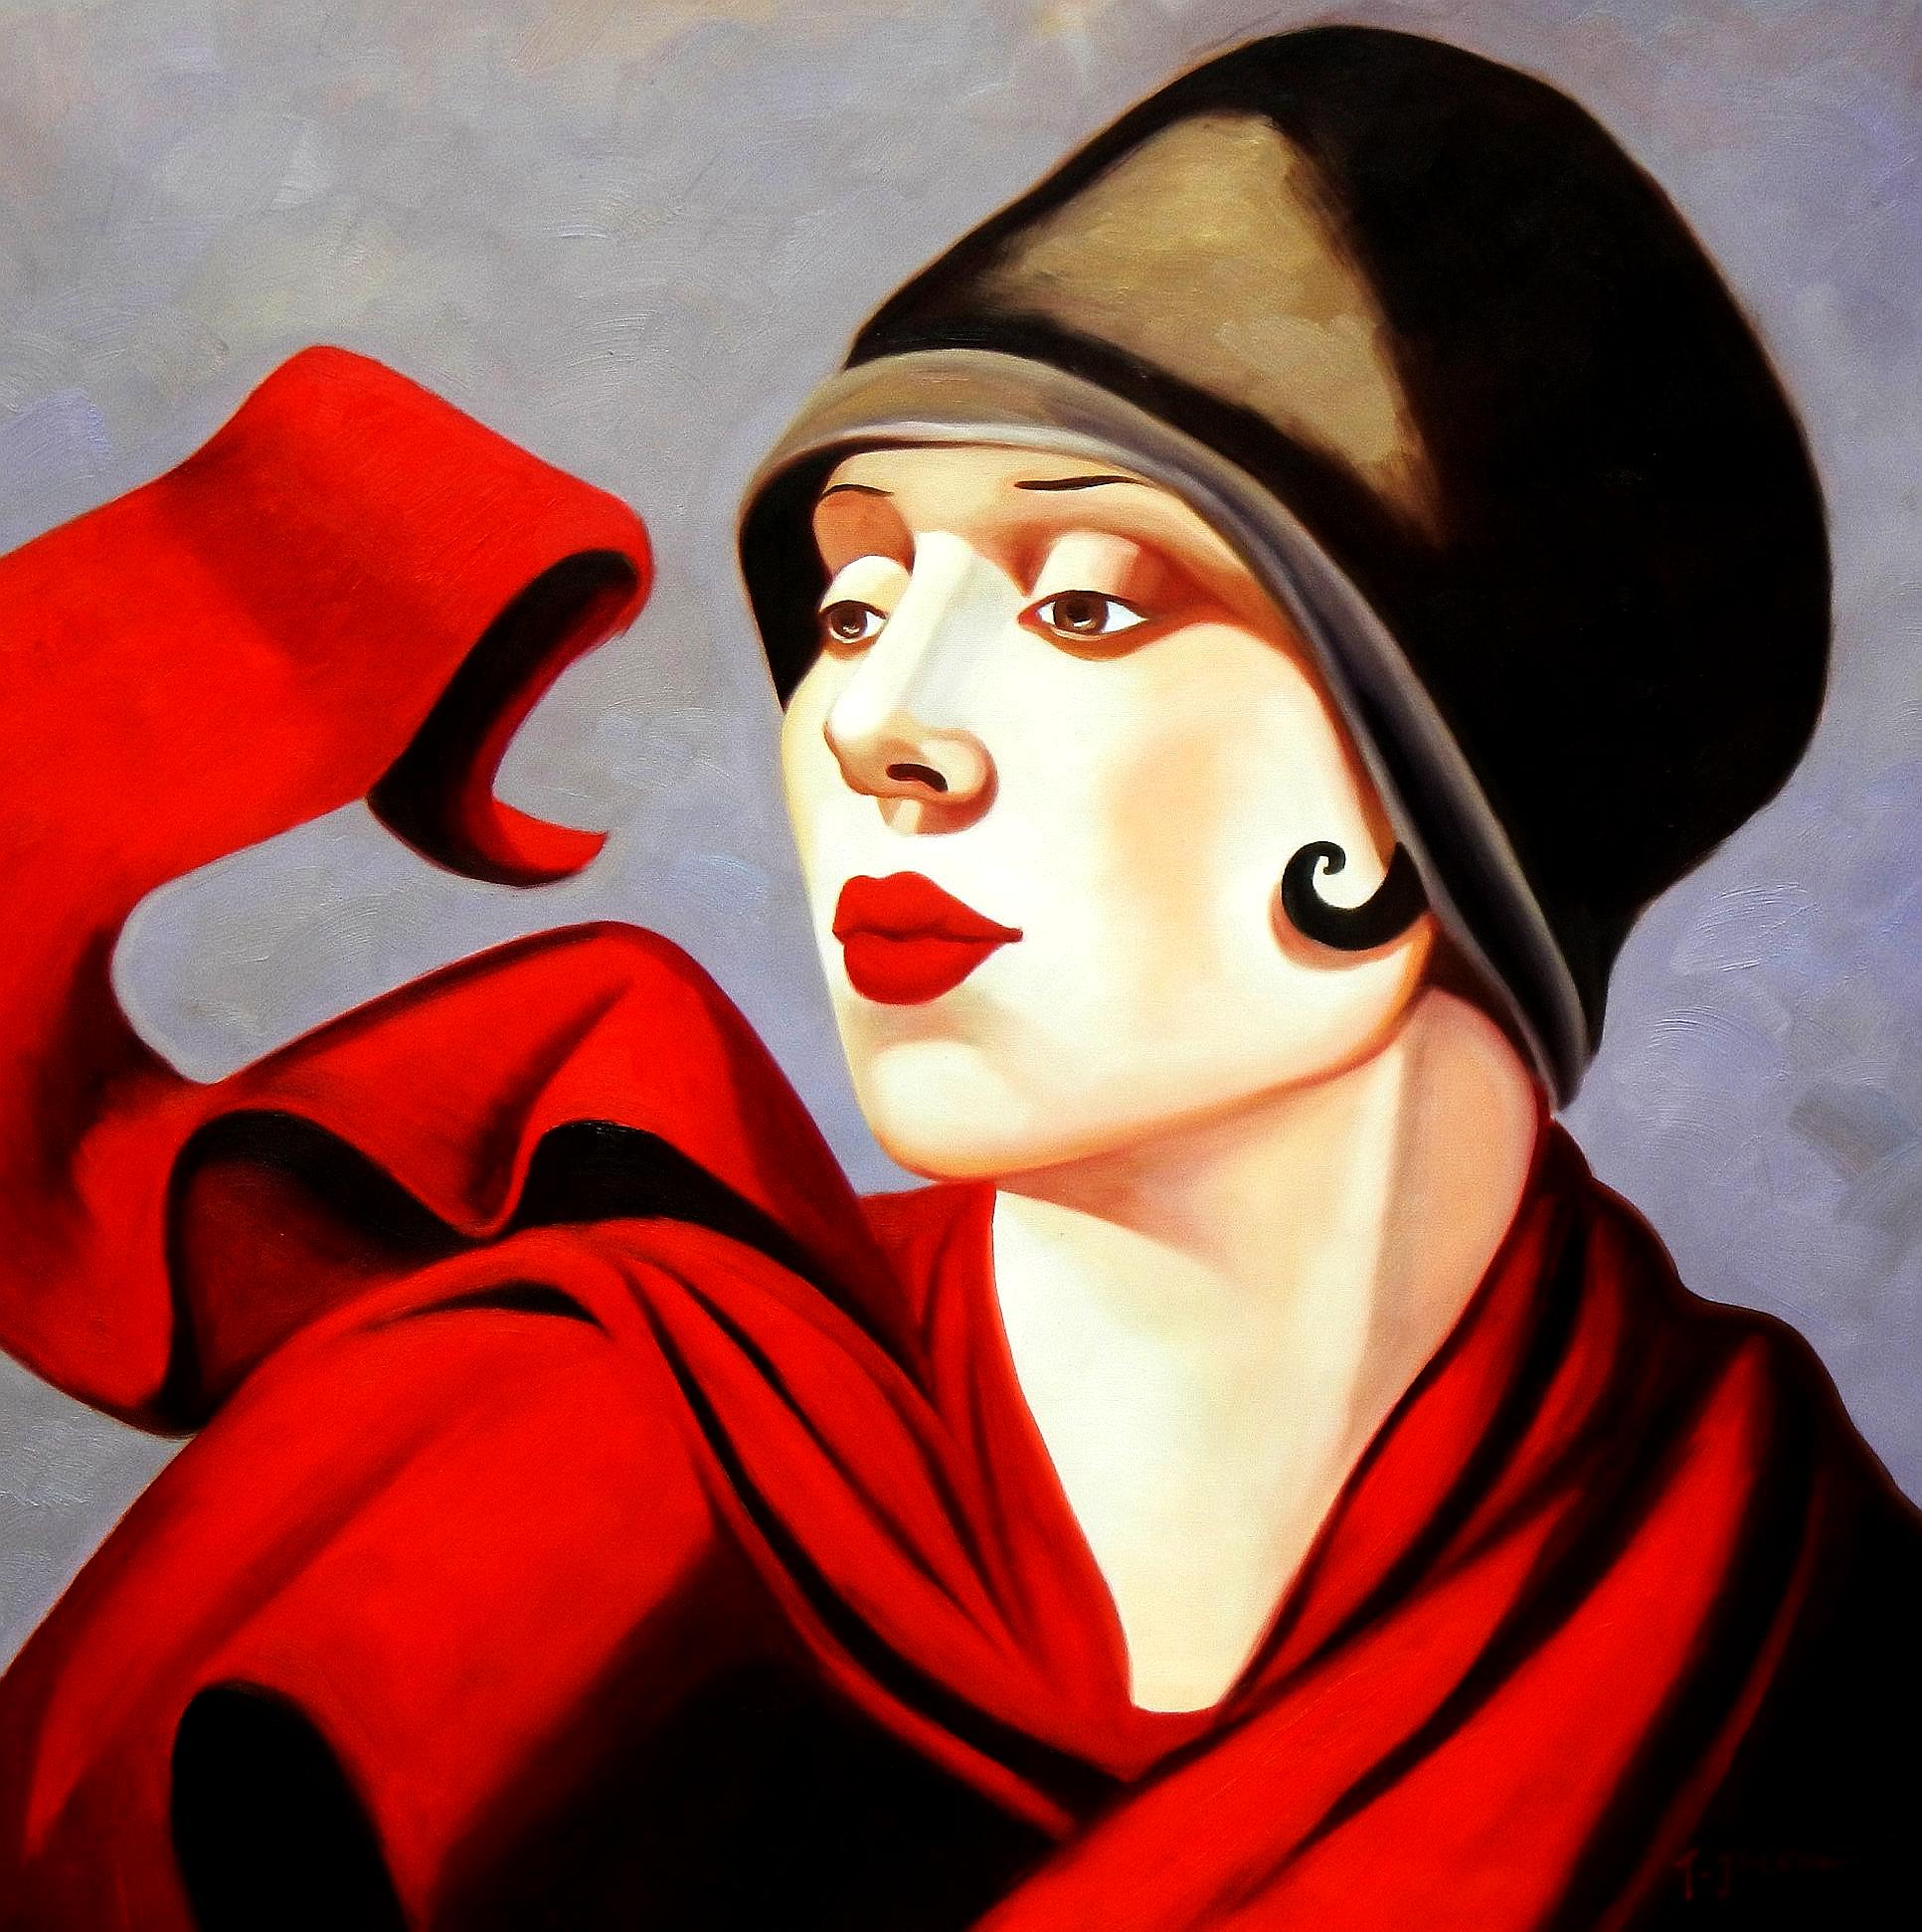 Homage of T. de Lempicka - Frau mit rotem Schal g94393 G 80x80cm exzellentes Ölbild